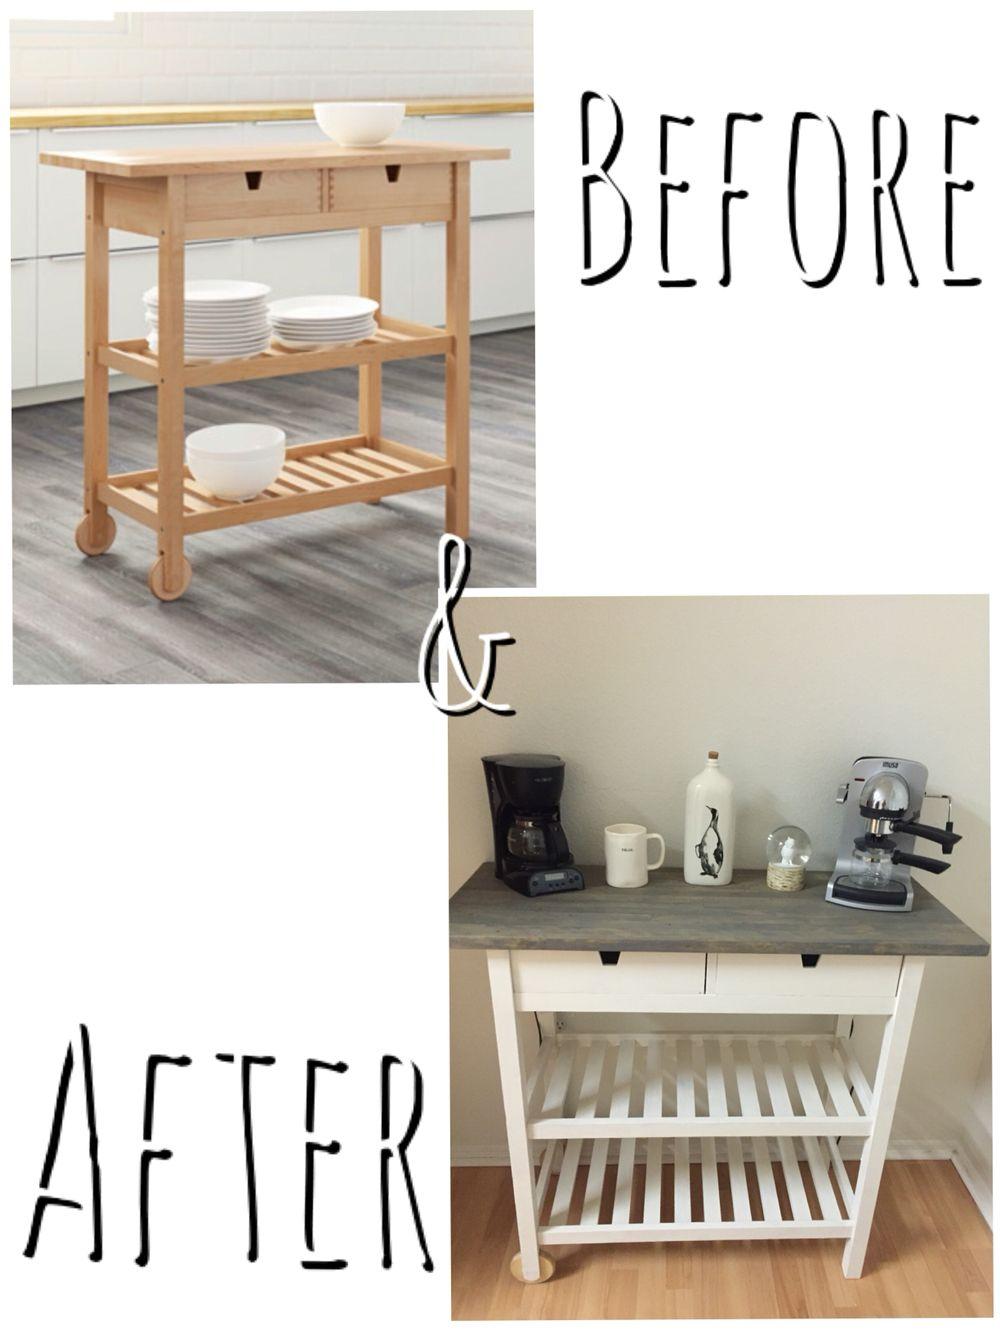 Used Ikea diy coffee bar using ikea's forhoja cart. purchased used kitchen